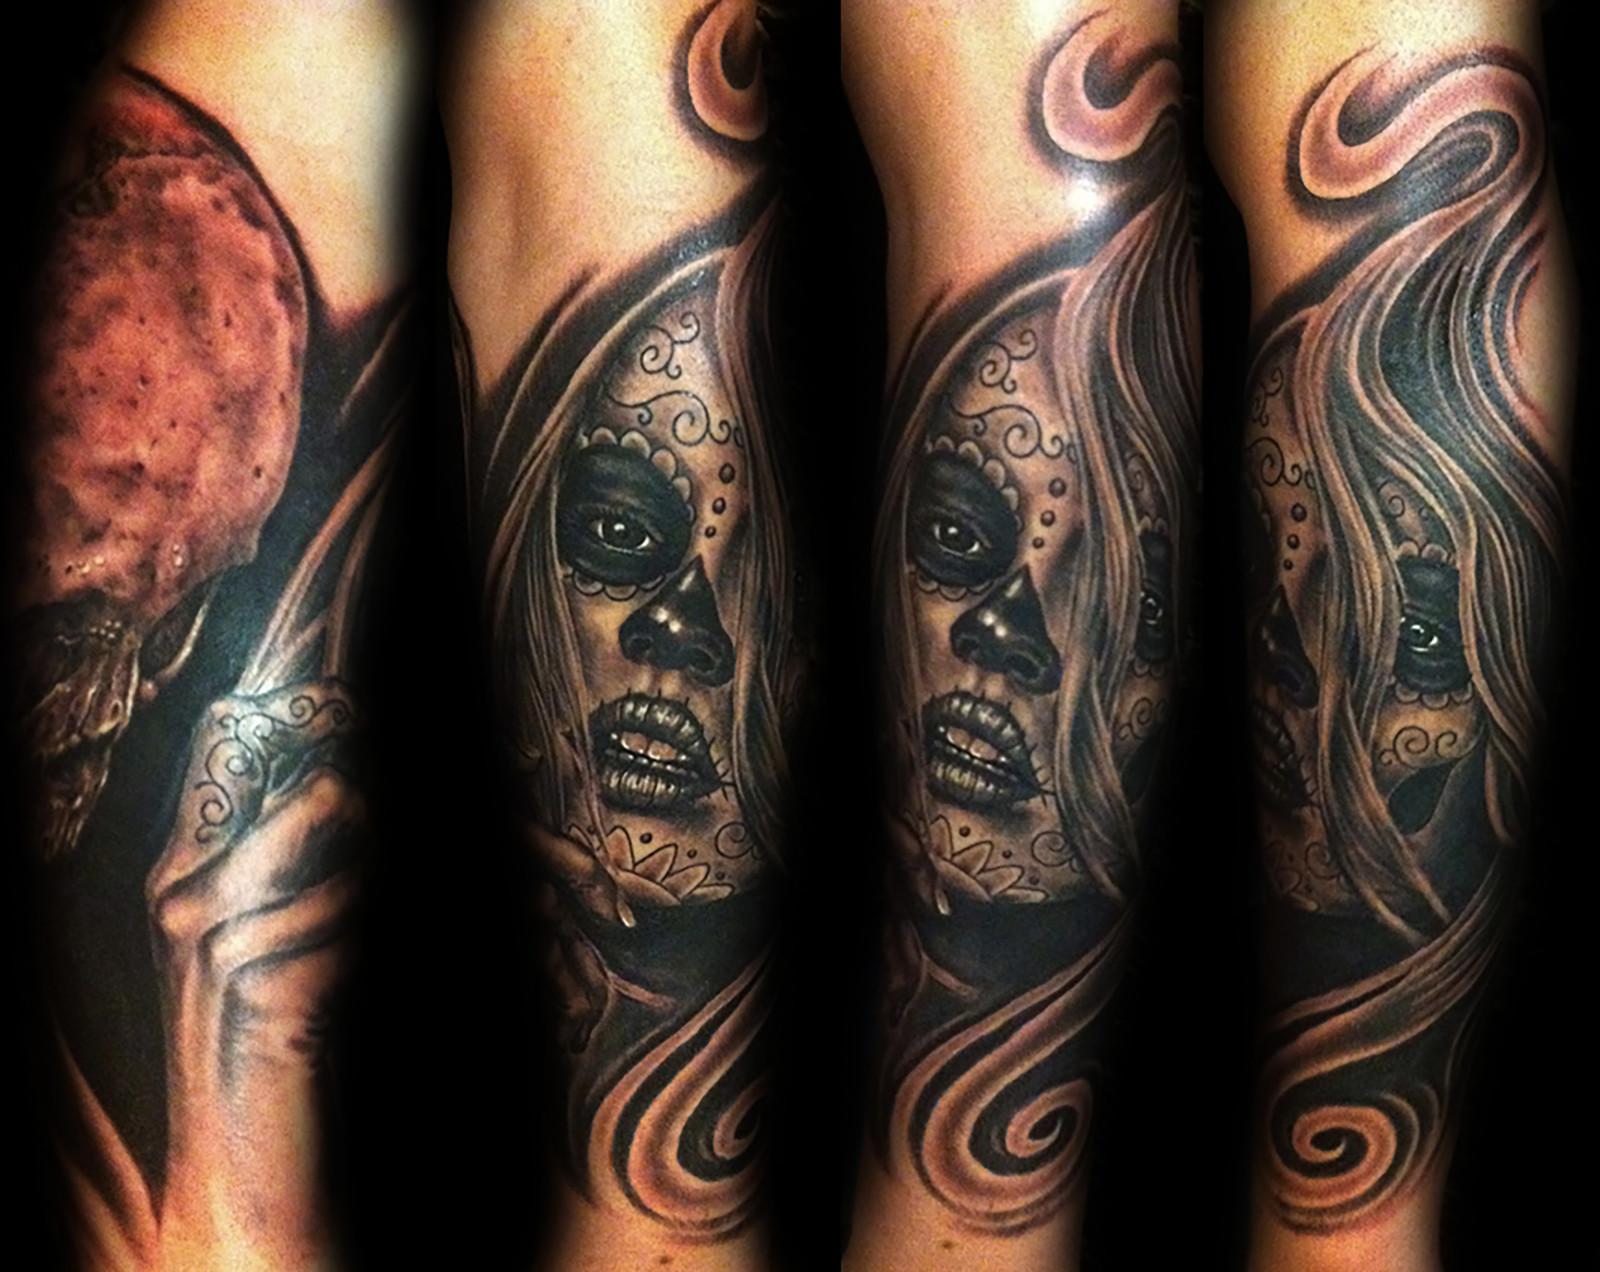 Day of the dead tattoos las vegas best tattoo shops strip for Tattoo shops on the vegas strip